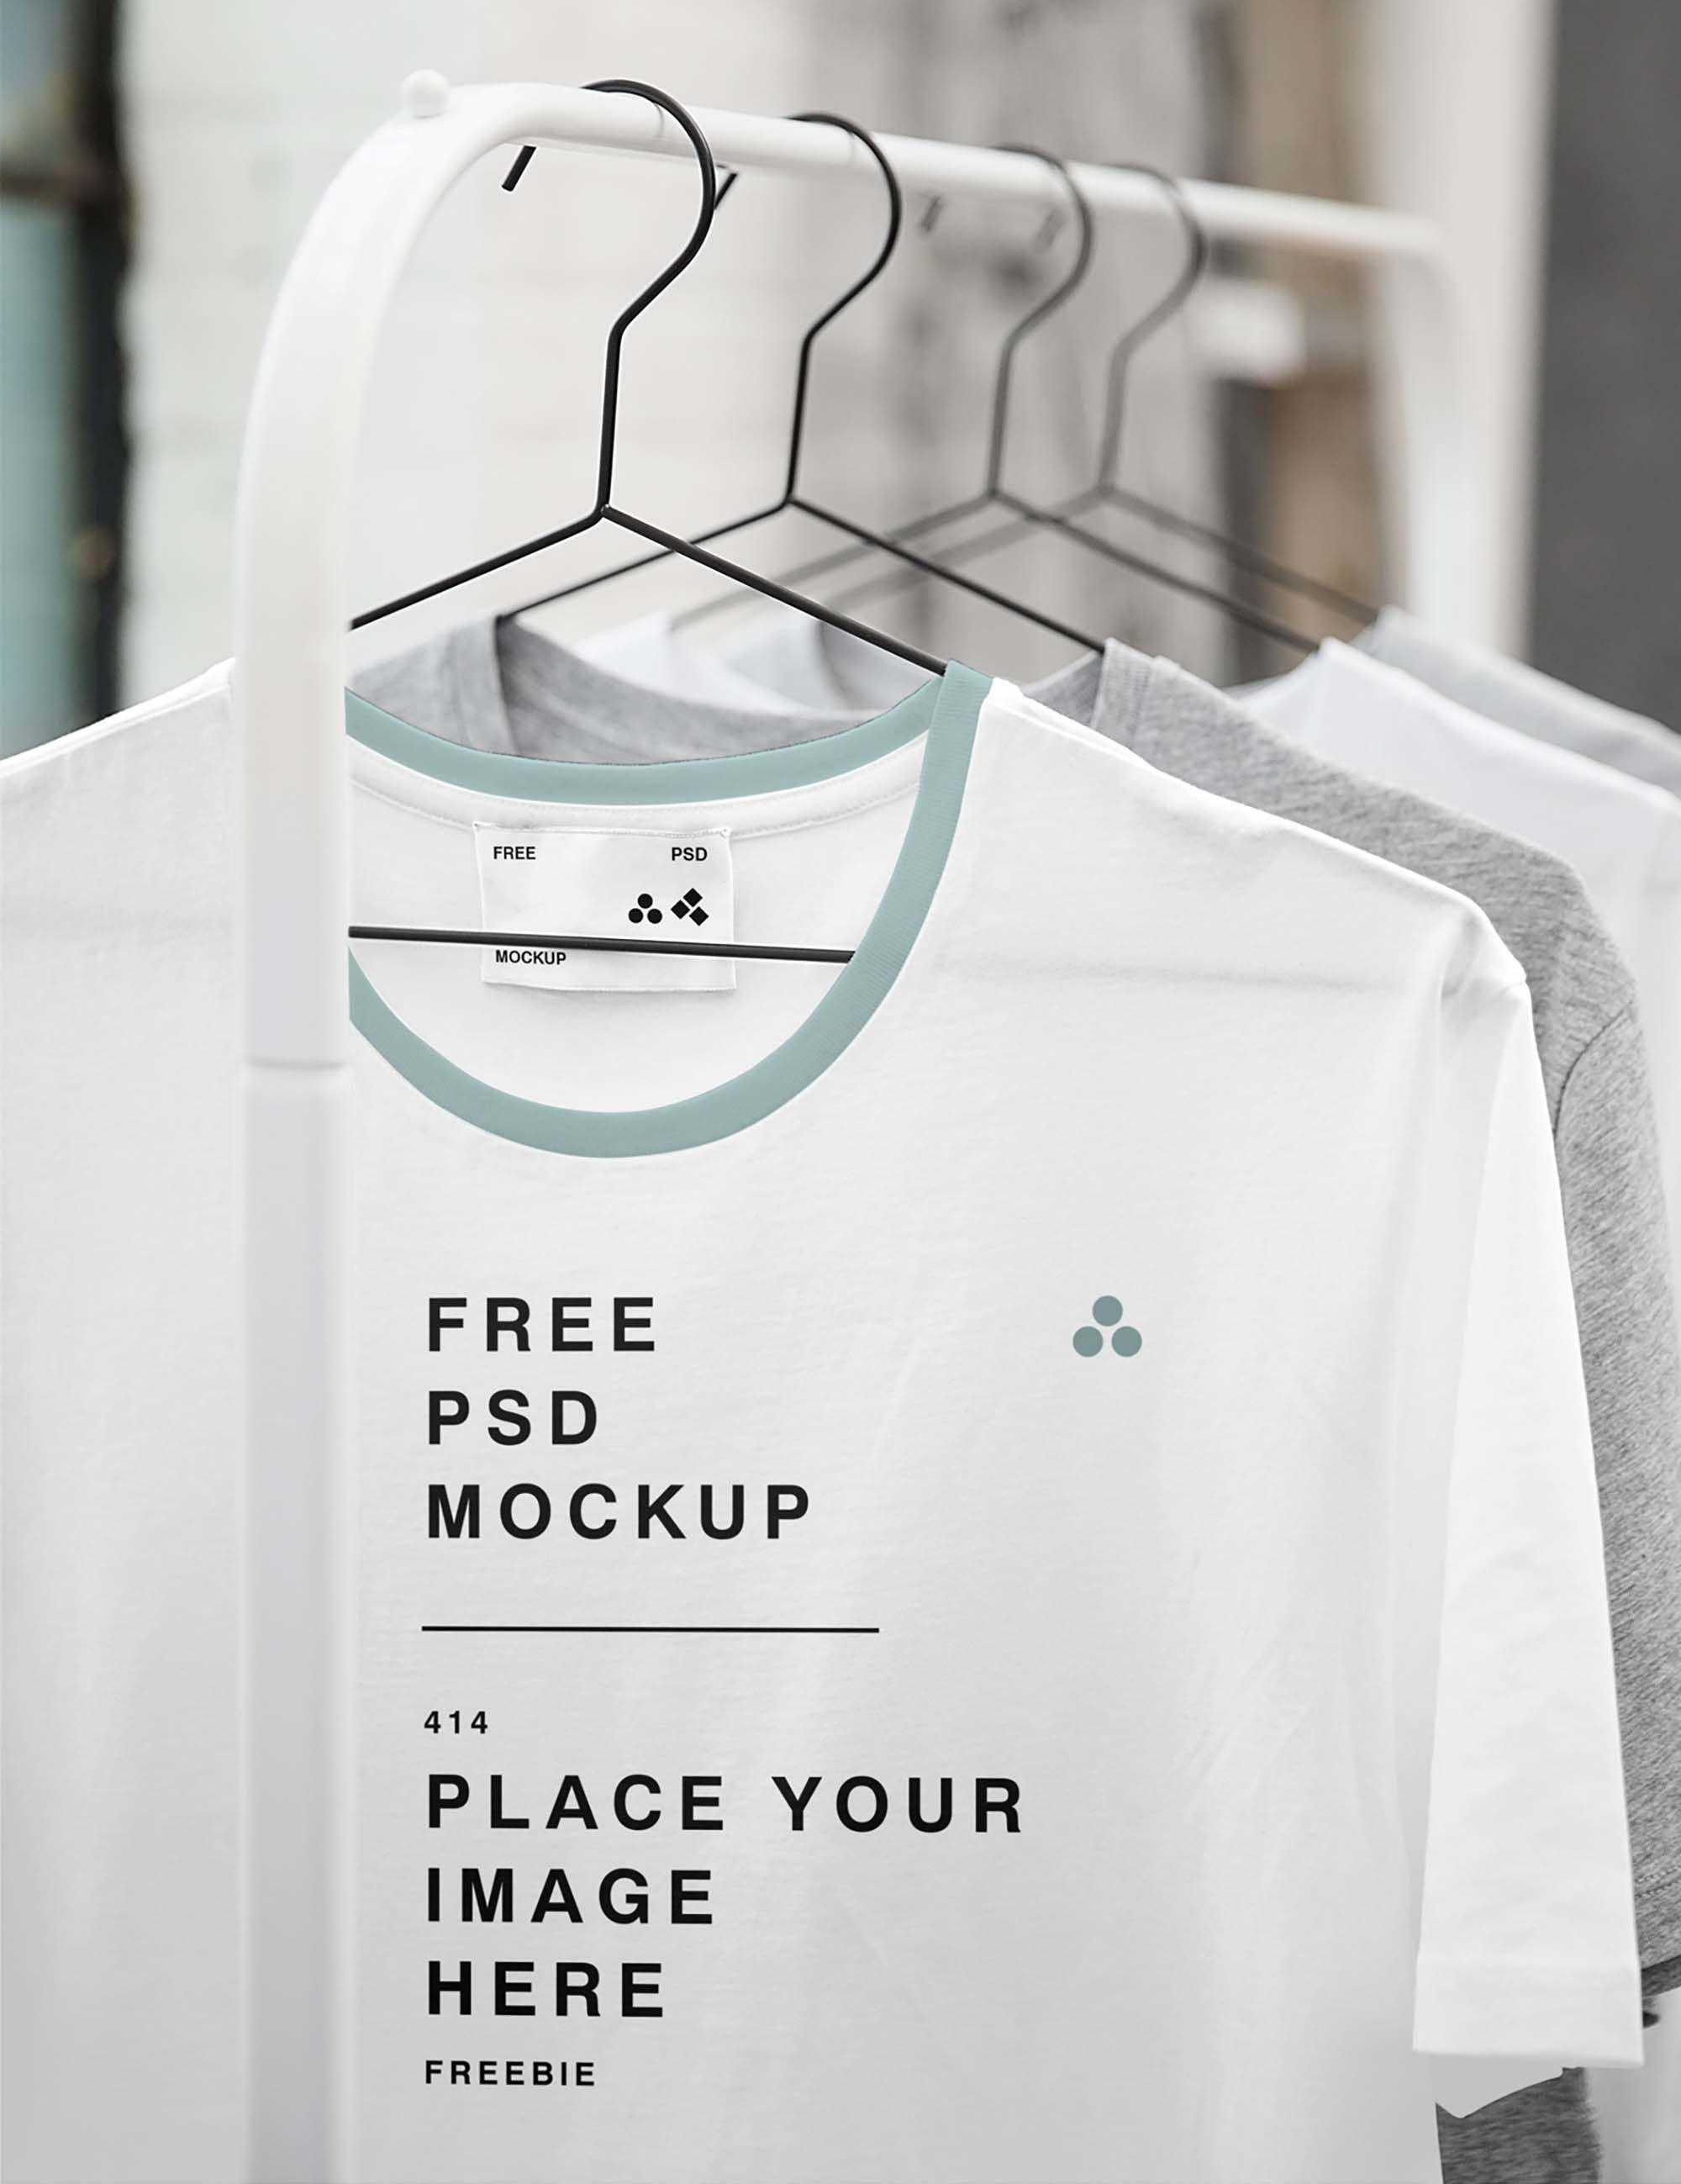 Download Clothing Store Hanged T Shirt Mockup Tshirt Mockup Free Clothing Mockup Tshirt Mockup